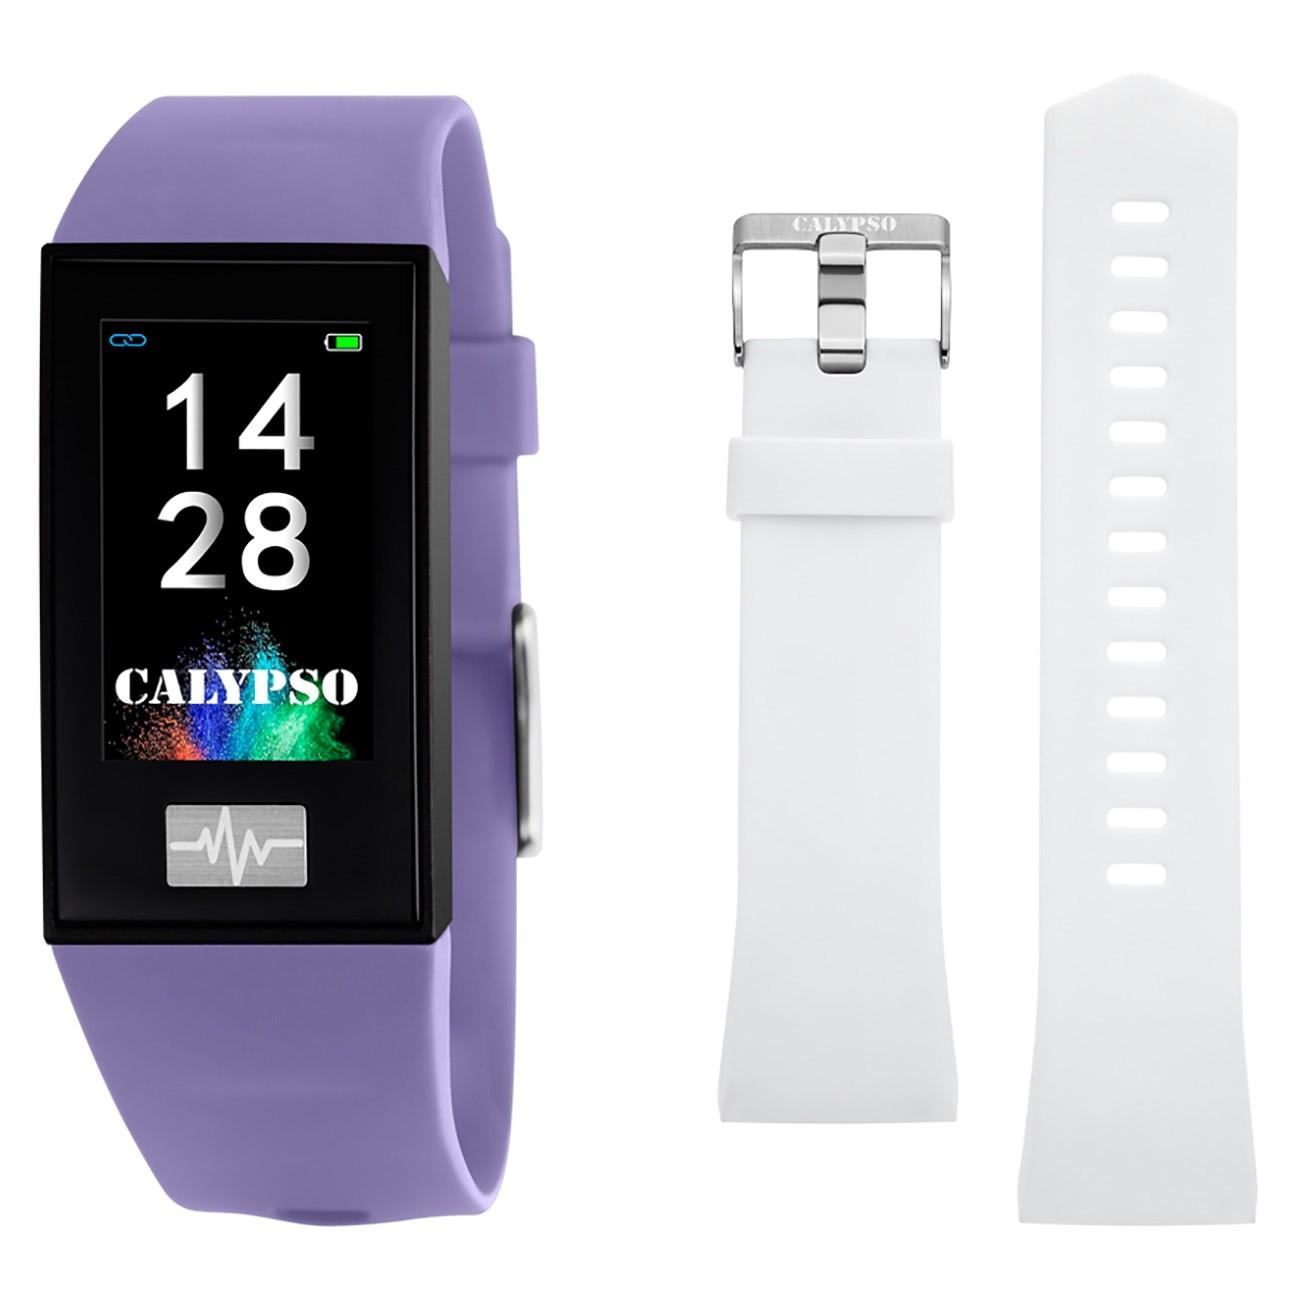 Calypso Fitness Tracker Smartime K8500-2 Smartwatch lila, weiß TCK8500-2